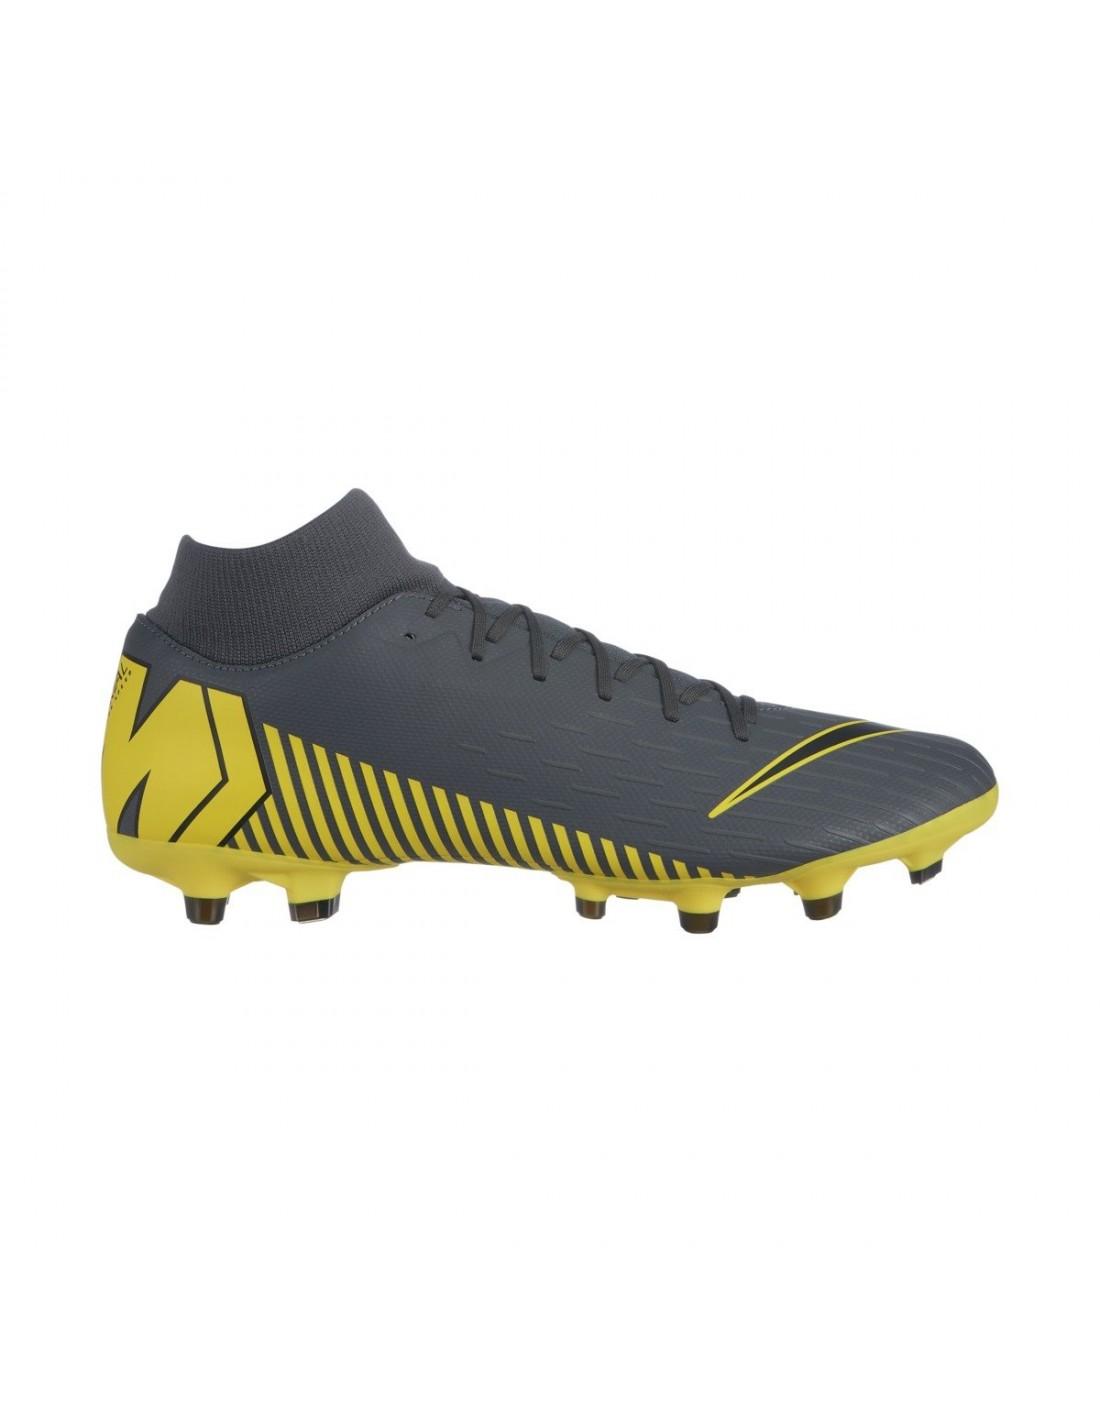 finest selection cb40c 2601a ... Fotballsko Men s Nike Superfly 6 Academy MG Mu AH7362 ...